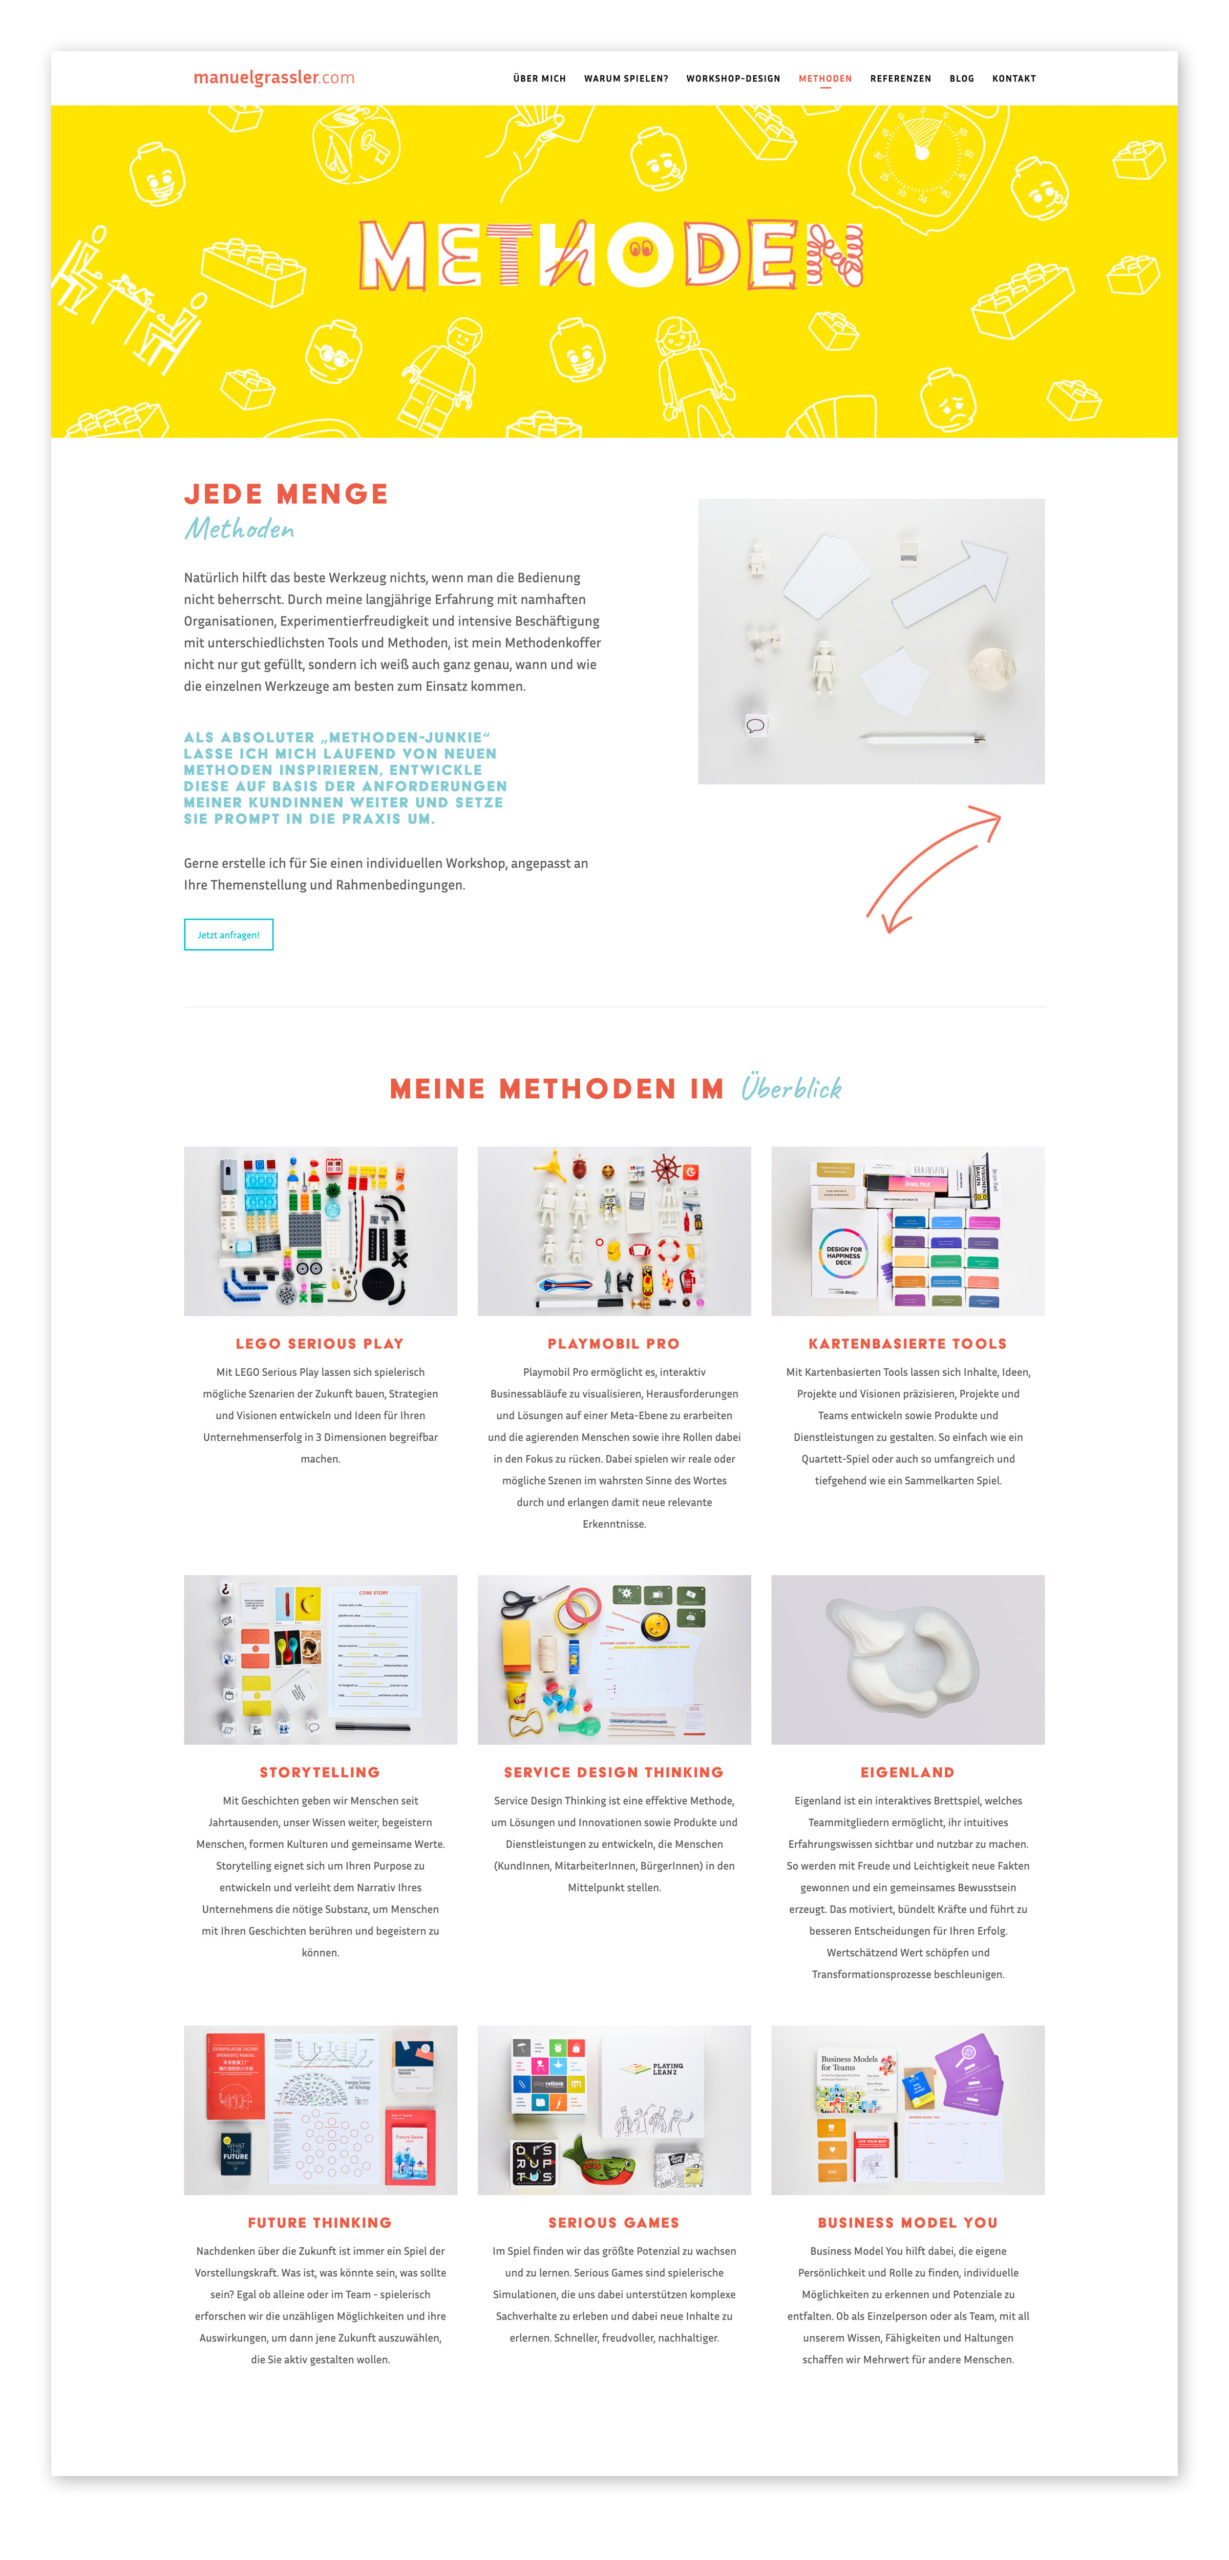 LOOK_Manuel_Grassler_web_Showcase_Methoden